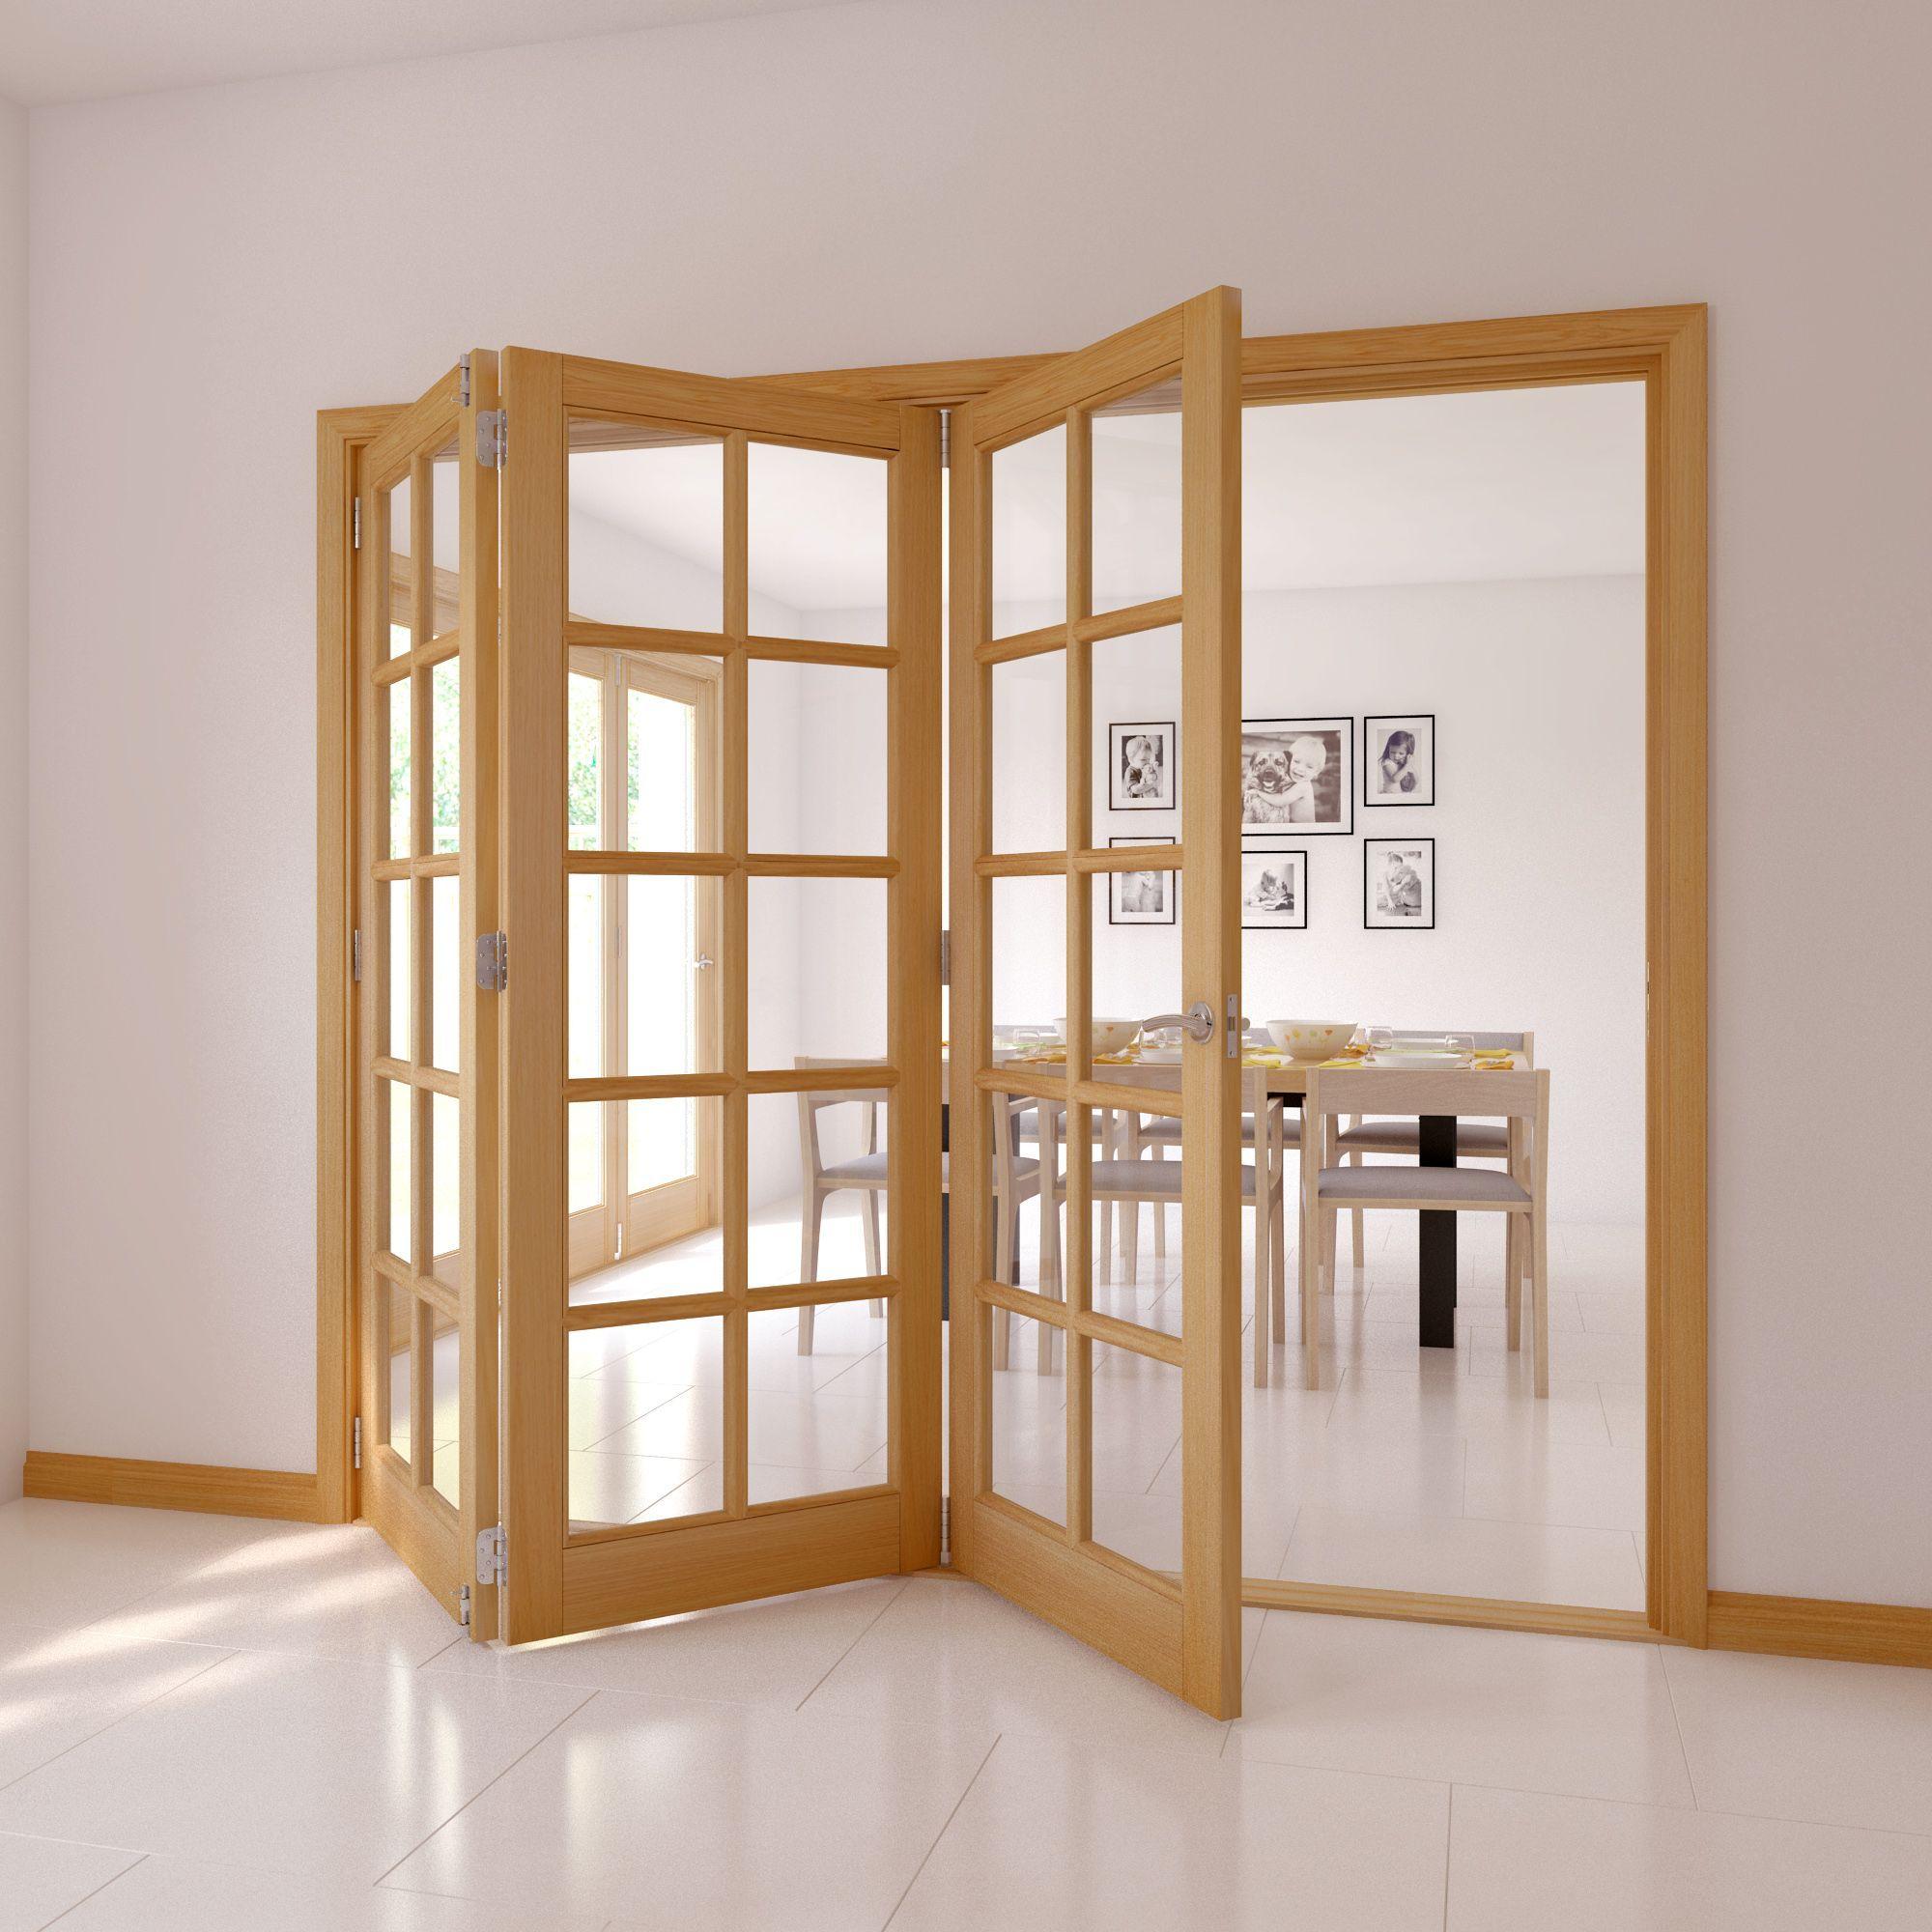 trifold exterior dazzling express doors perth leeds fold ideas internal bifold of bi gallery folding by google stunning